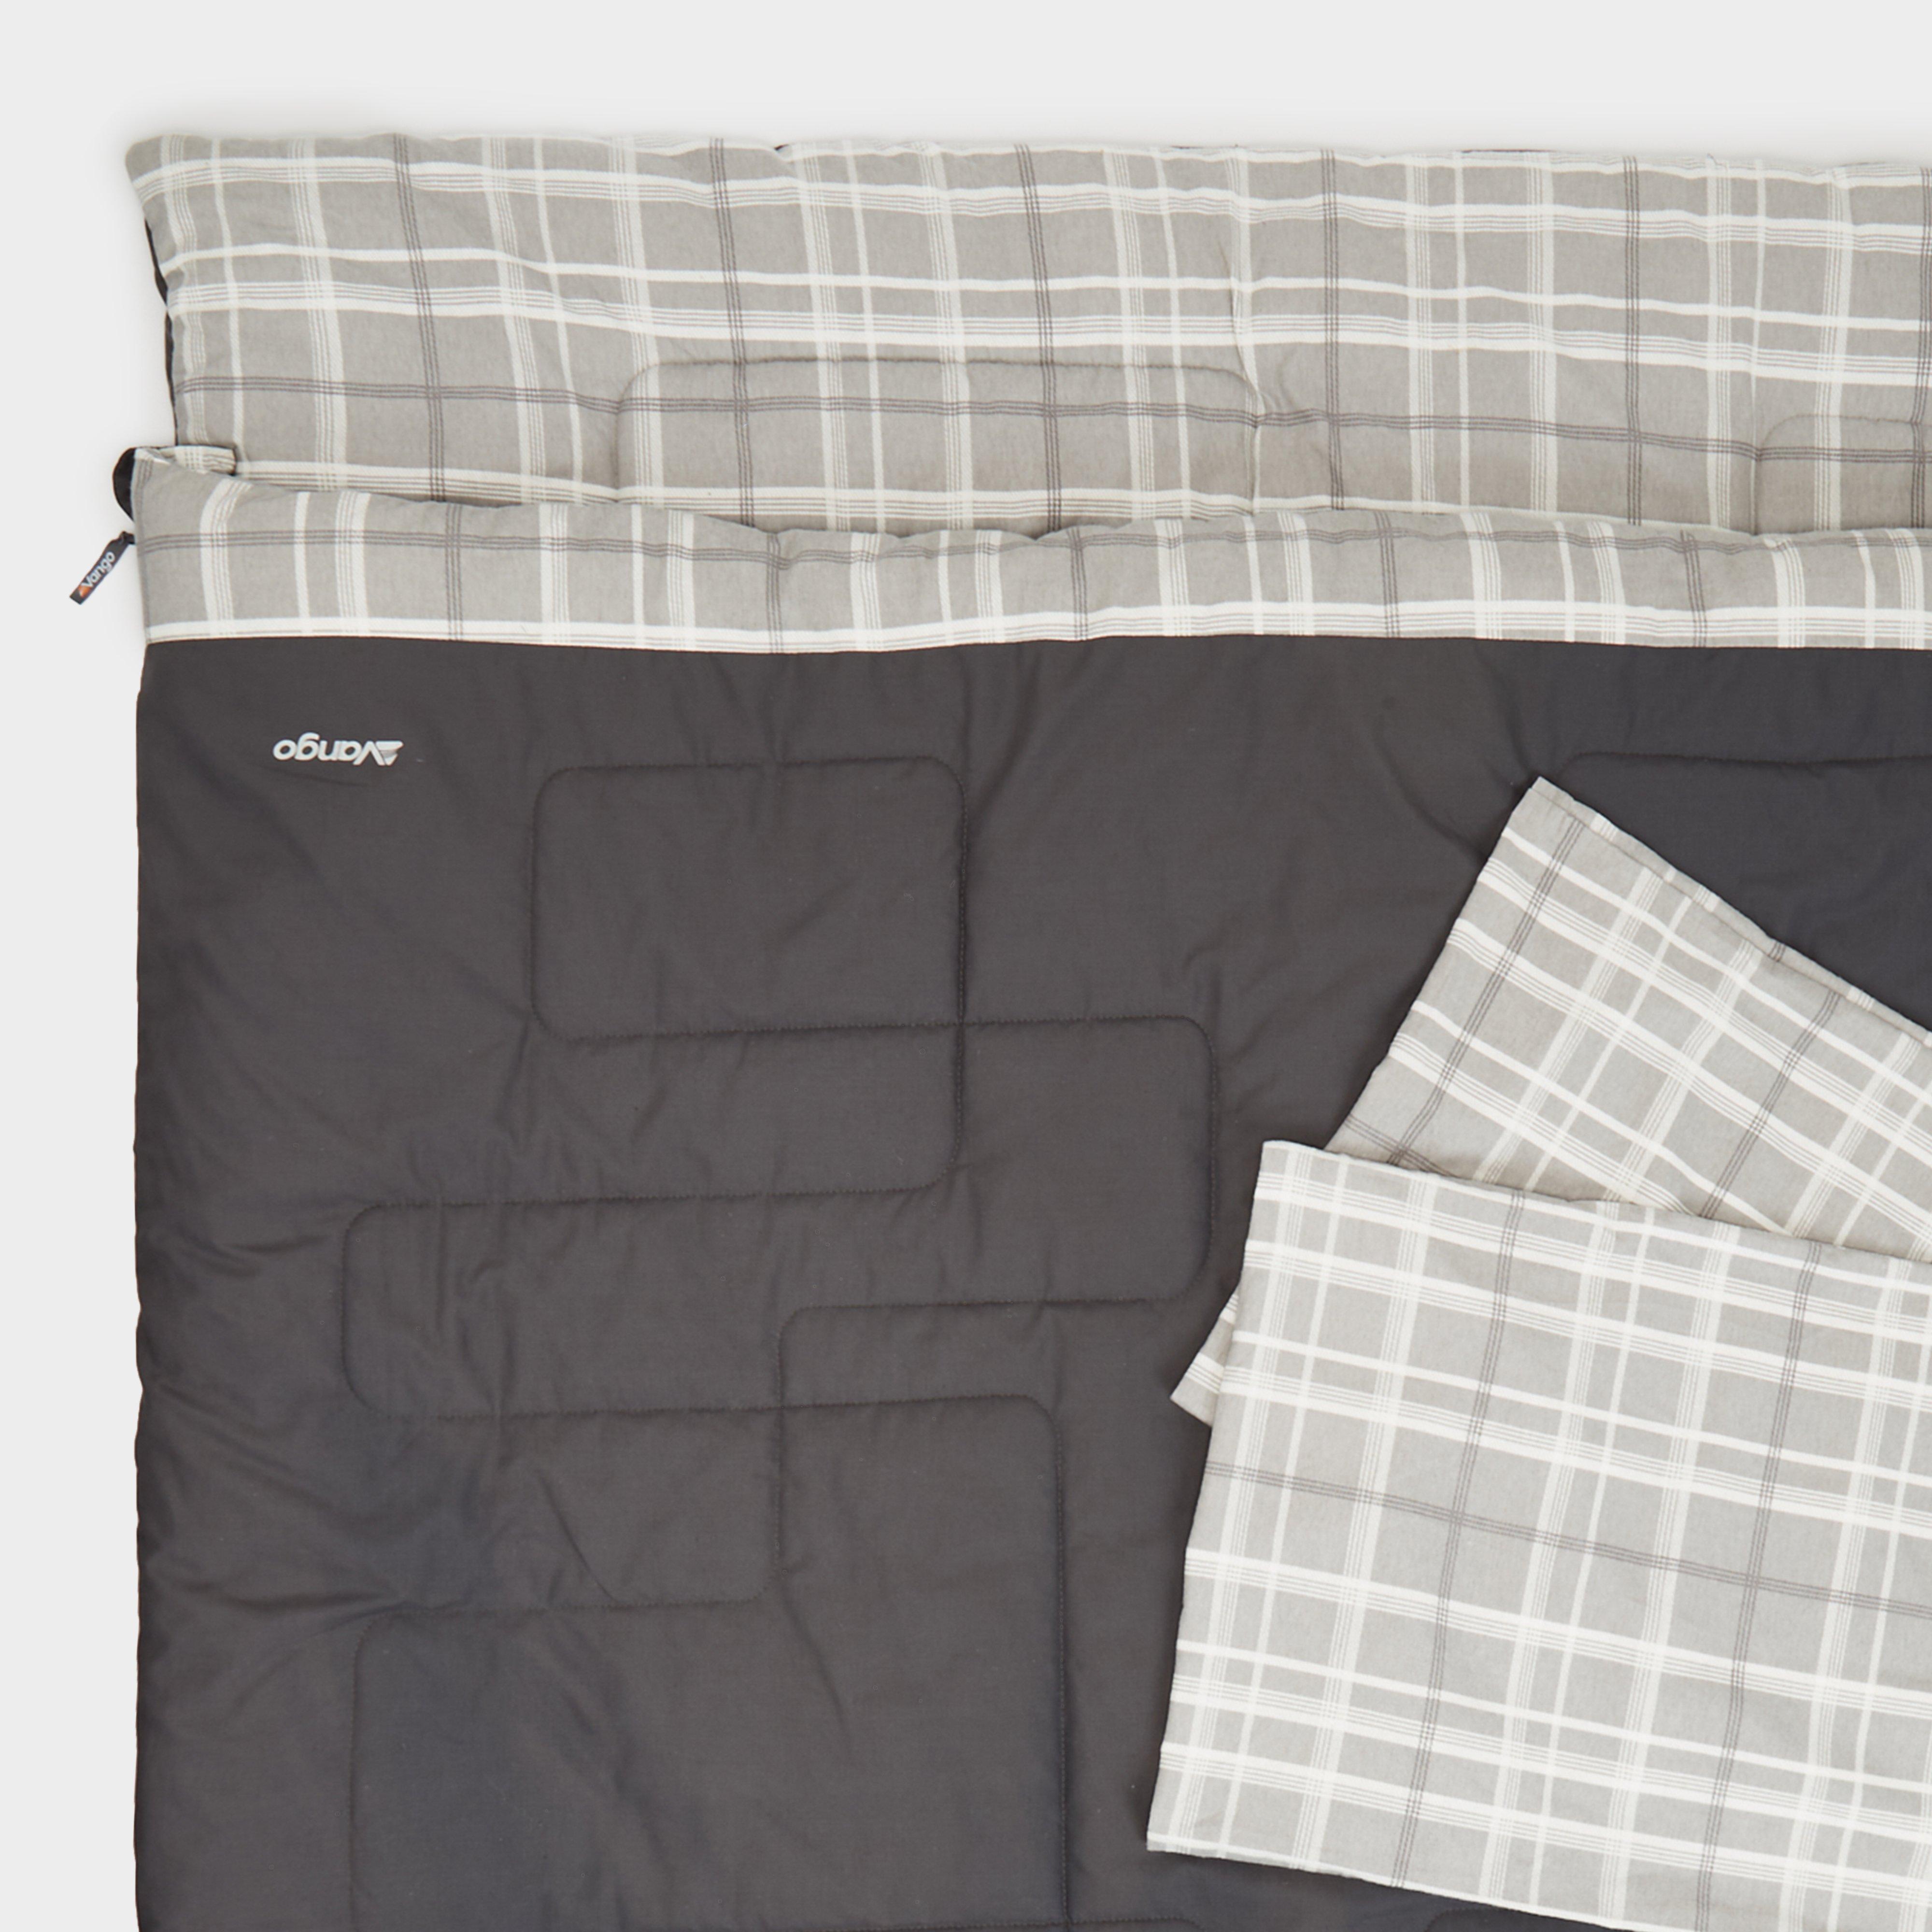 VANGO Selene Quick Air 7.5 King Double Sleeping Mat, Grey/VG